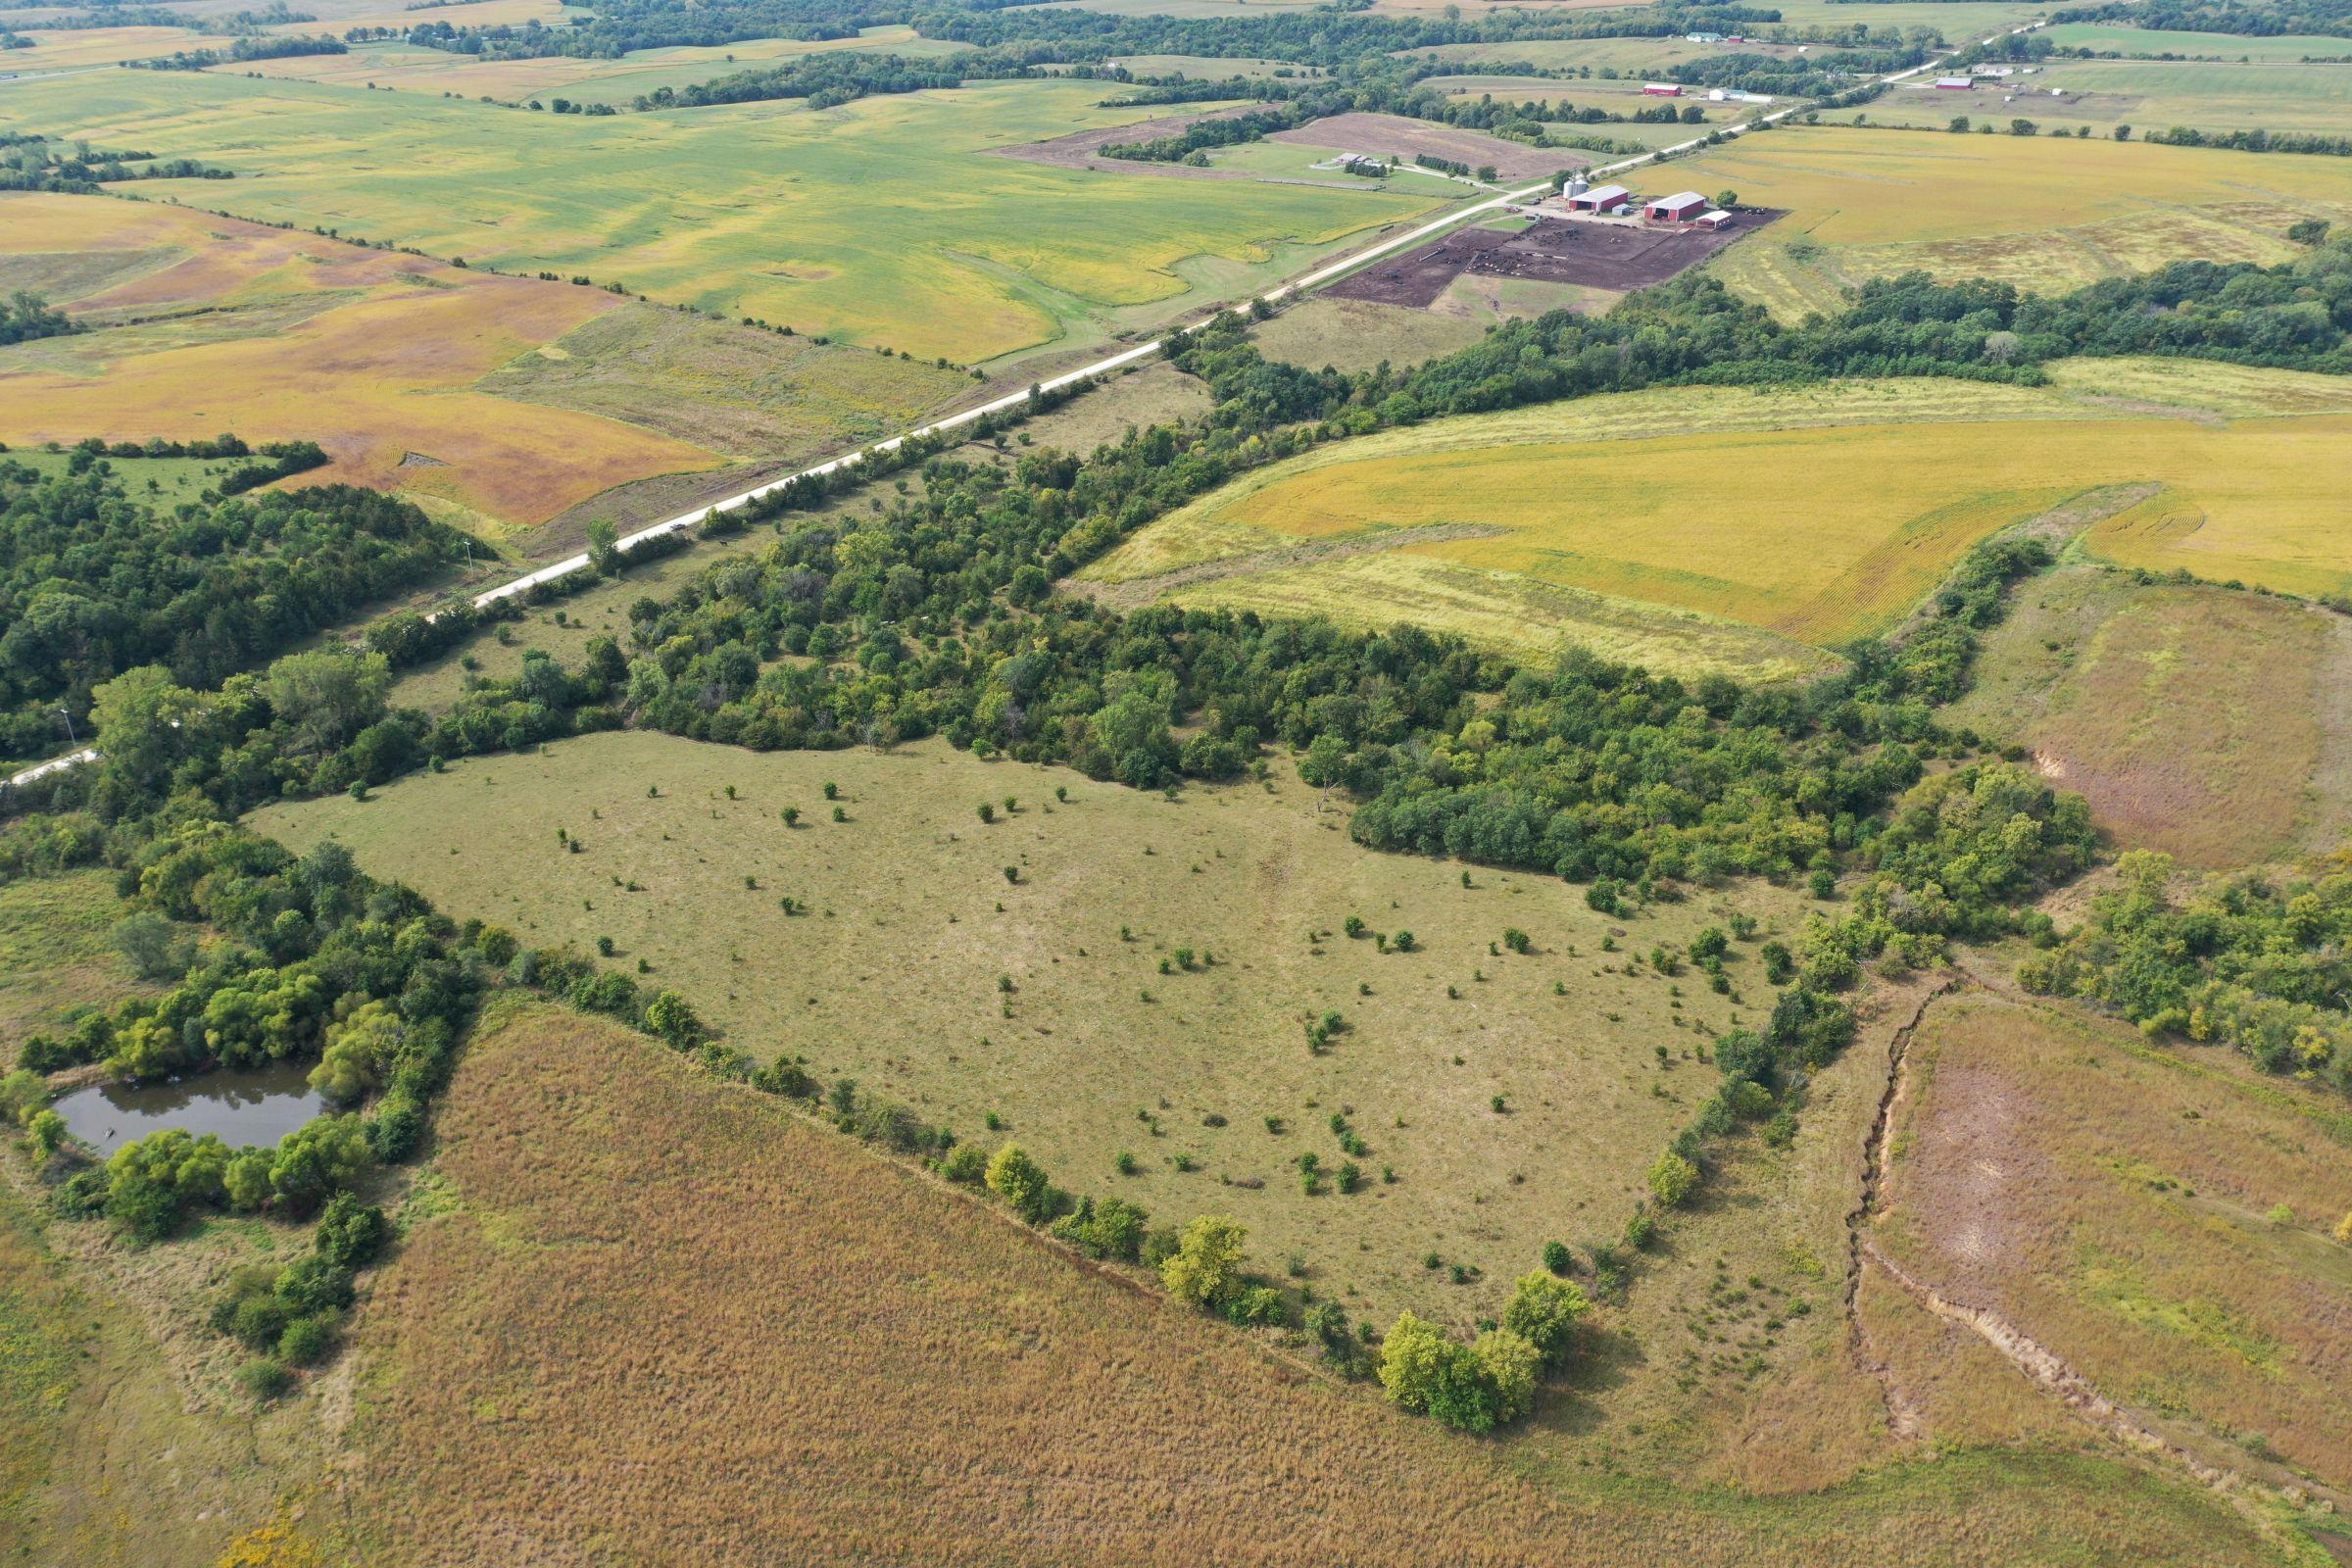 clarke-county-iowa-37-acres-listing-number-15398-0-2021-03-08-151444.jpg